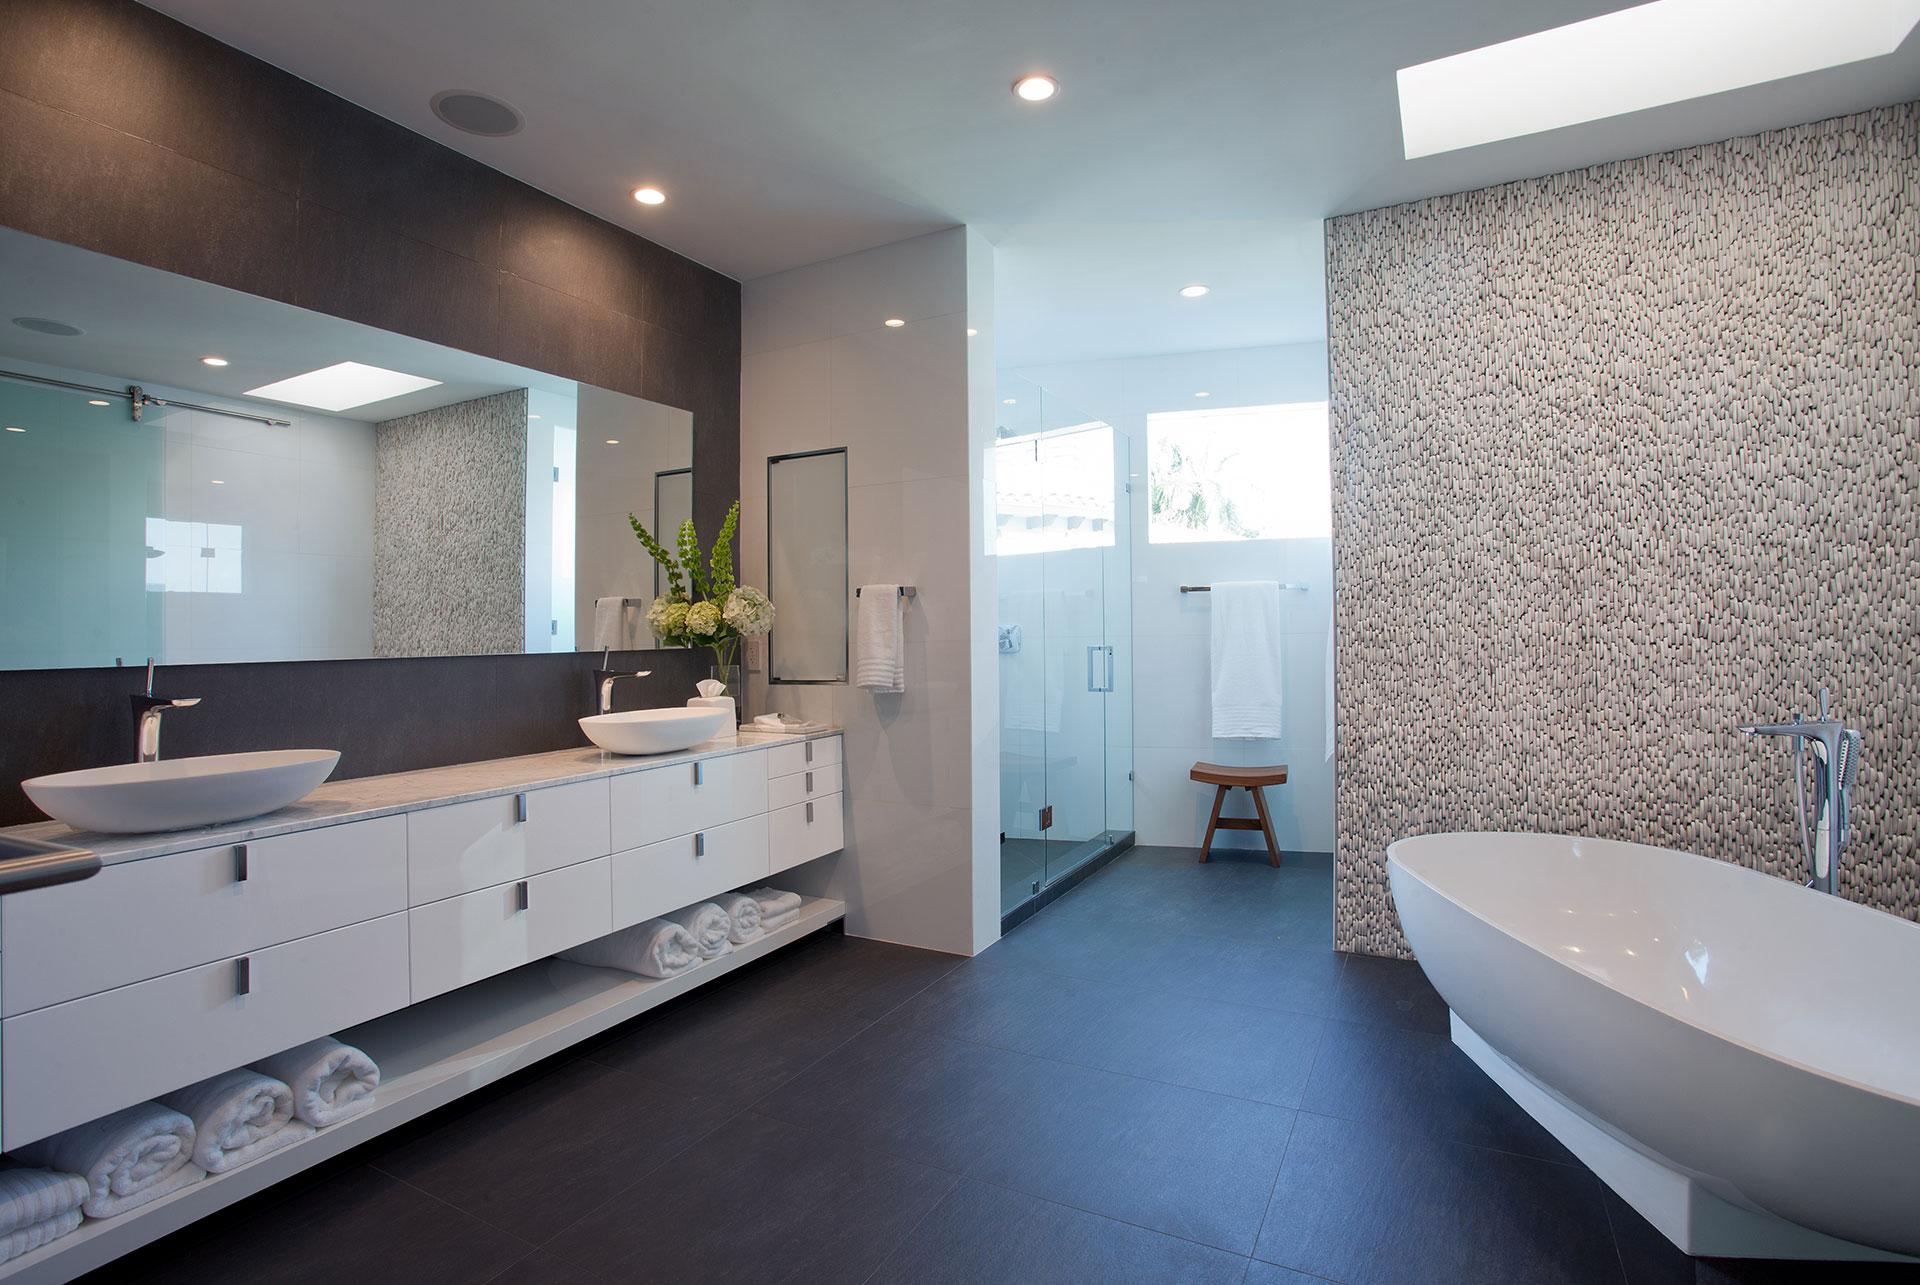 Interior Design bathroom side view project in 96 Golden Beach Drive, Florida